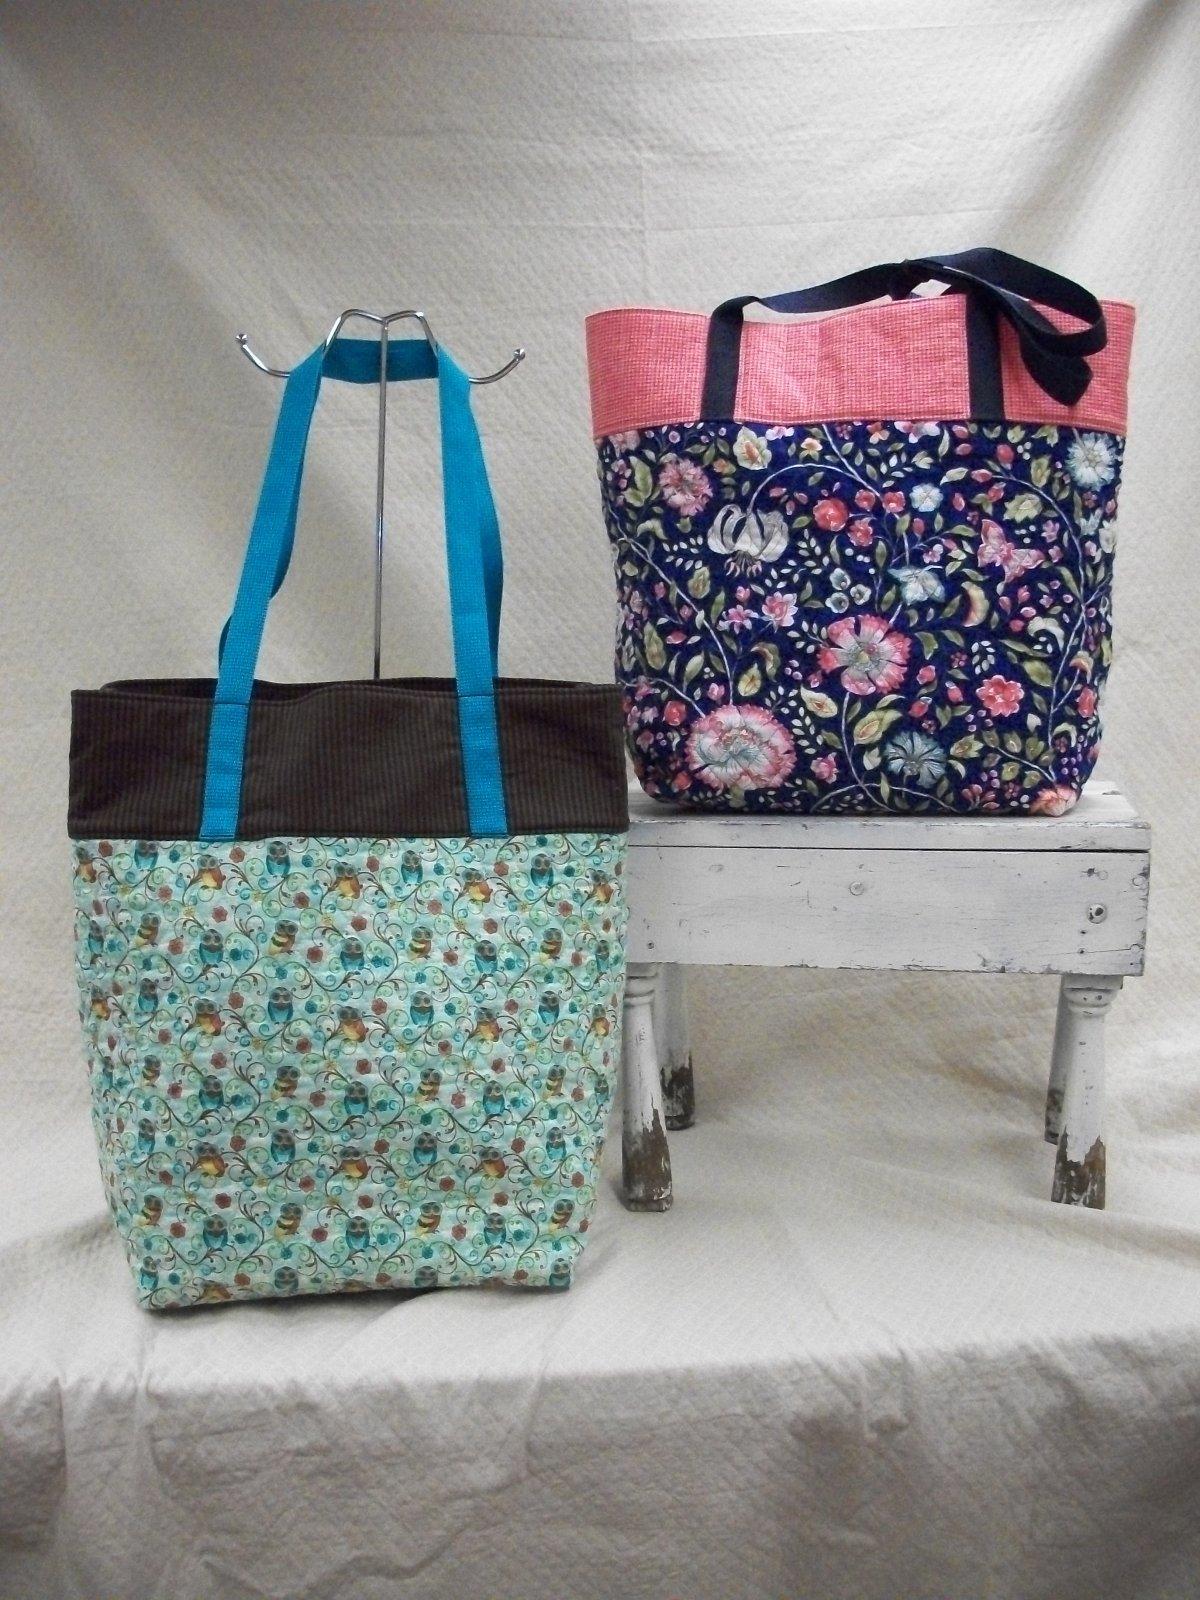 The Amazing Bagcase